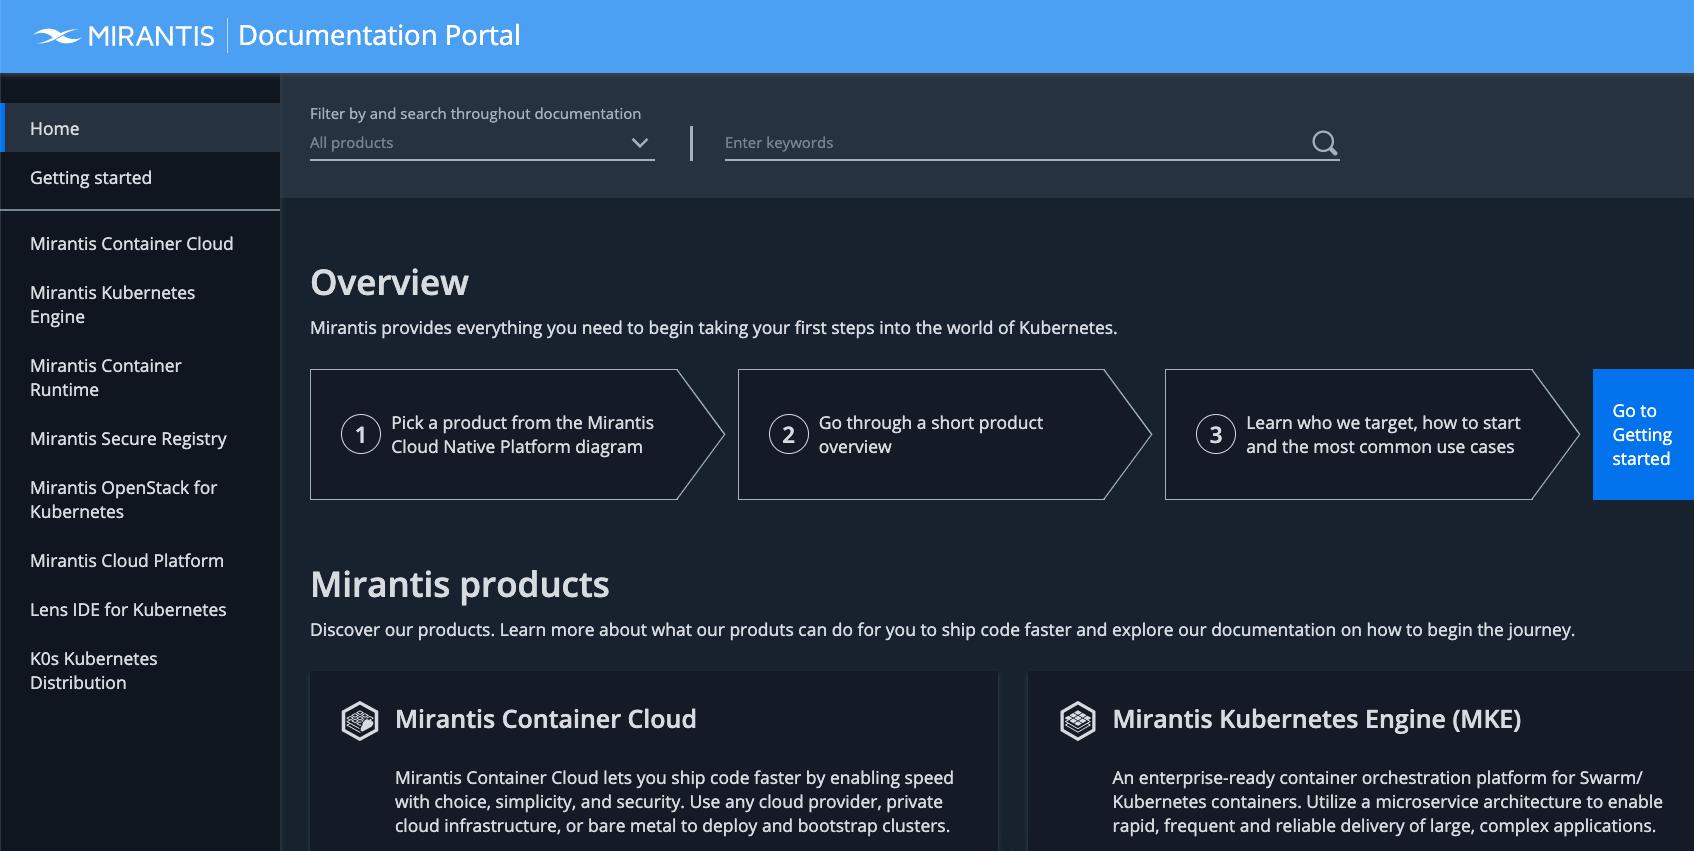 Mirantis Documentation Portal home page